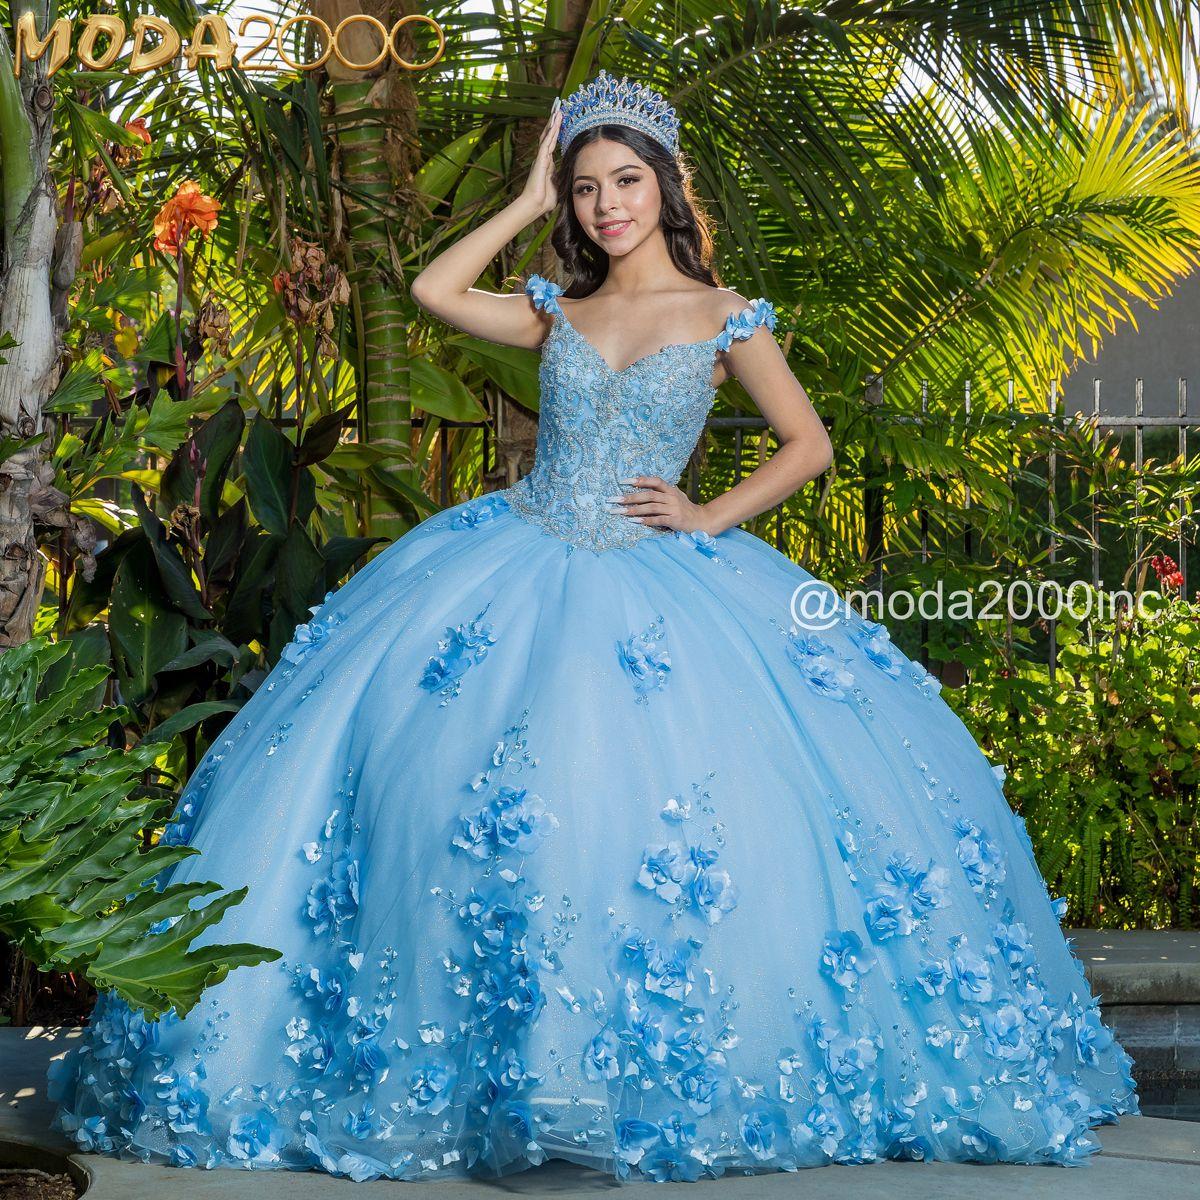 Enchanted Forest Bahama Blue Off The Shoulder Quince Dress Quinceanera Dresses Blue Quince Dresses Quince Dress [ 1200 x 1200 Pixel ]